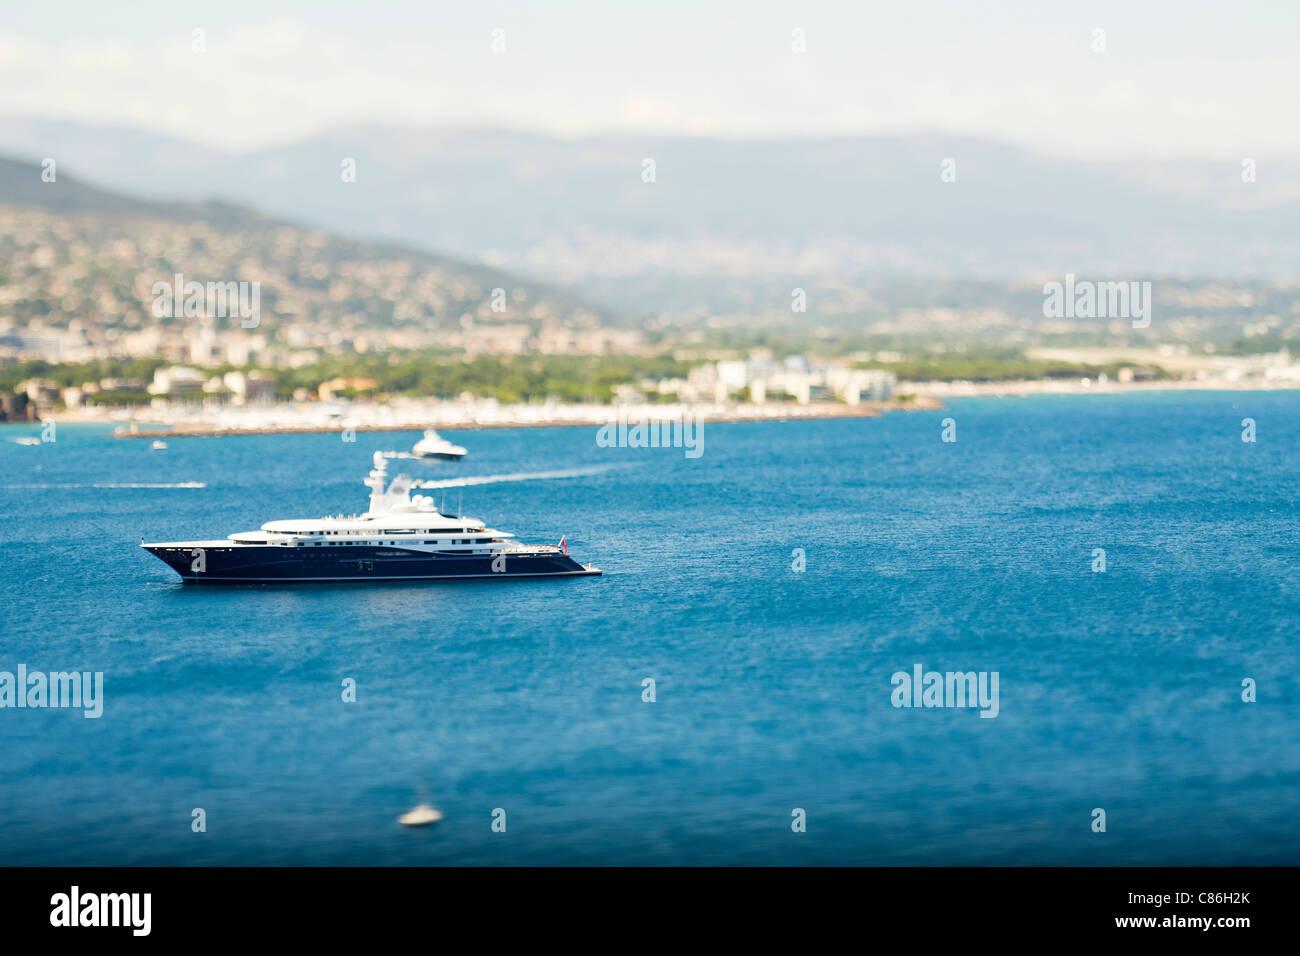 Yacht sailing by urban coastline - Stock Image